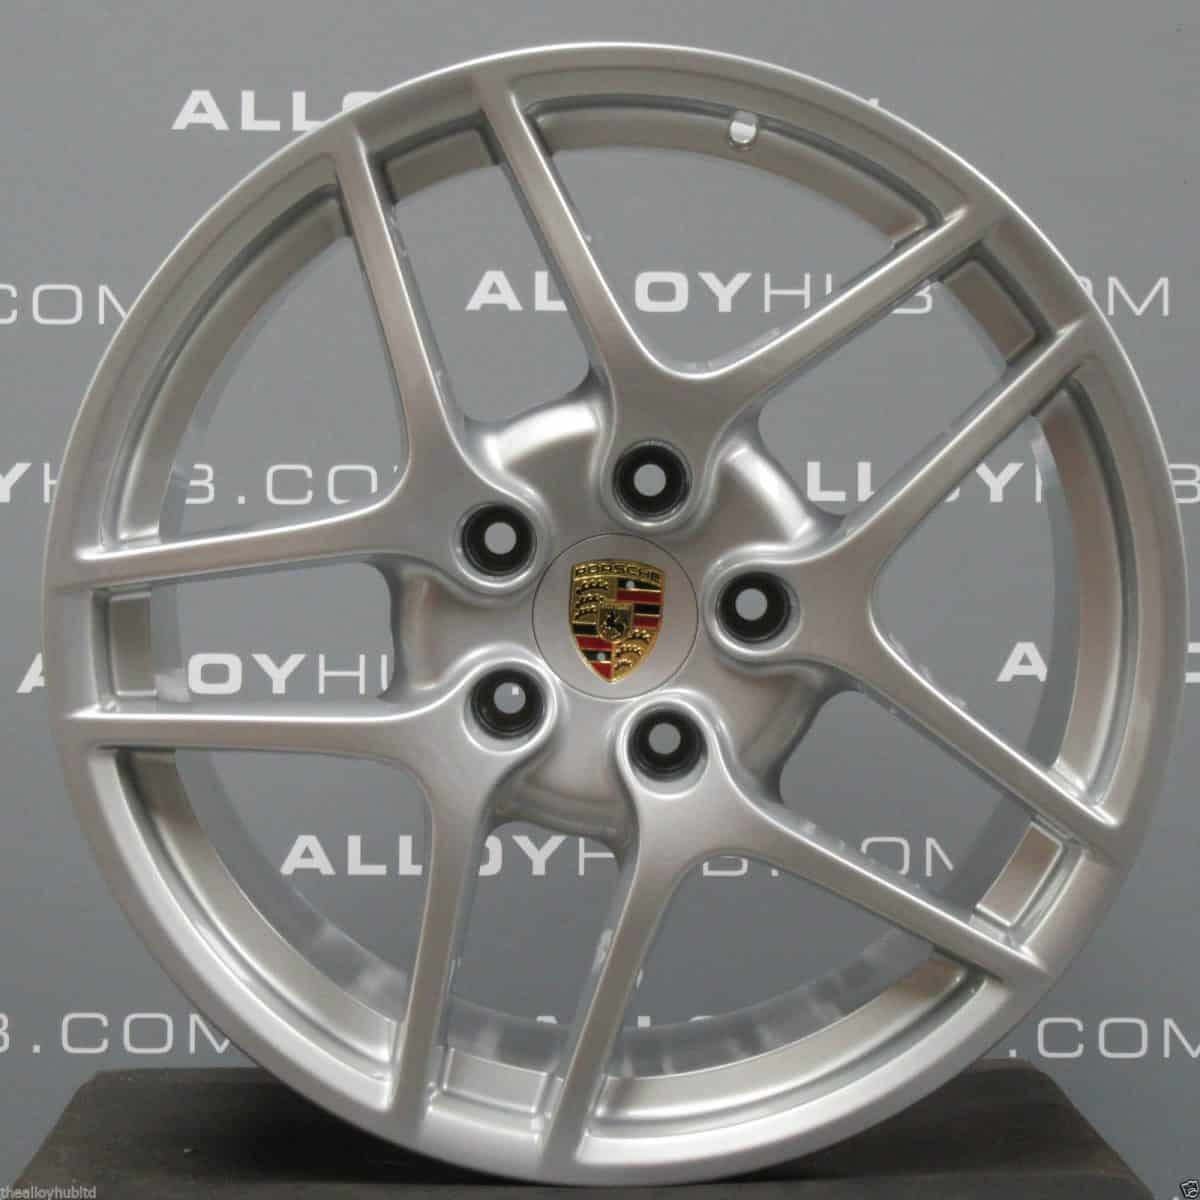 Genuine Porsche 911 997 Carrera 2/2S Gen 2 5 Twin Spoke 19″ Inch Alloy Wheels with Silver Finish 99736215700 99736216300